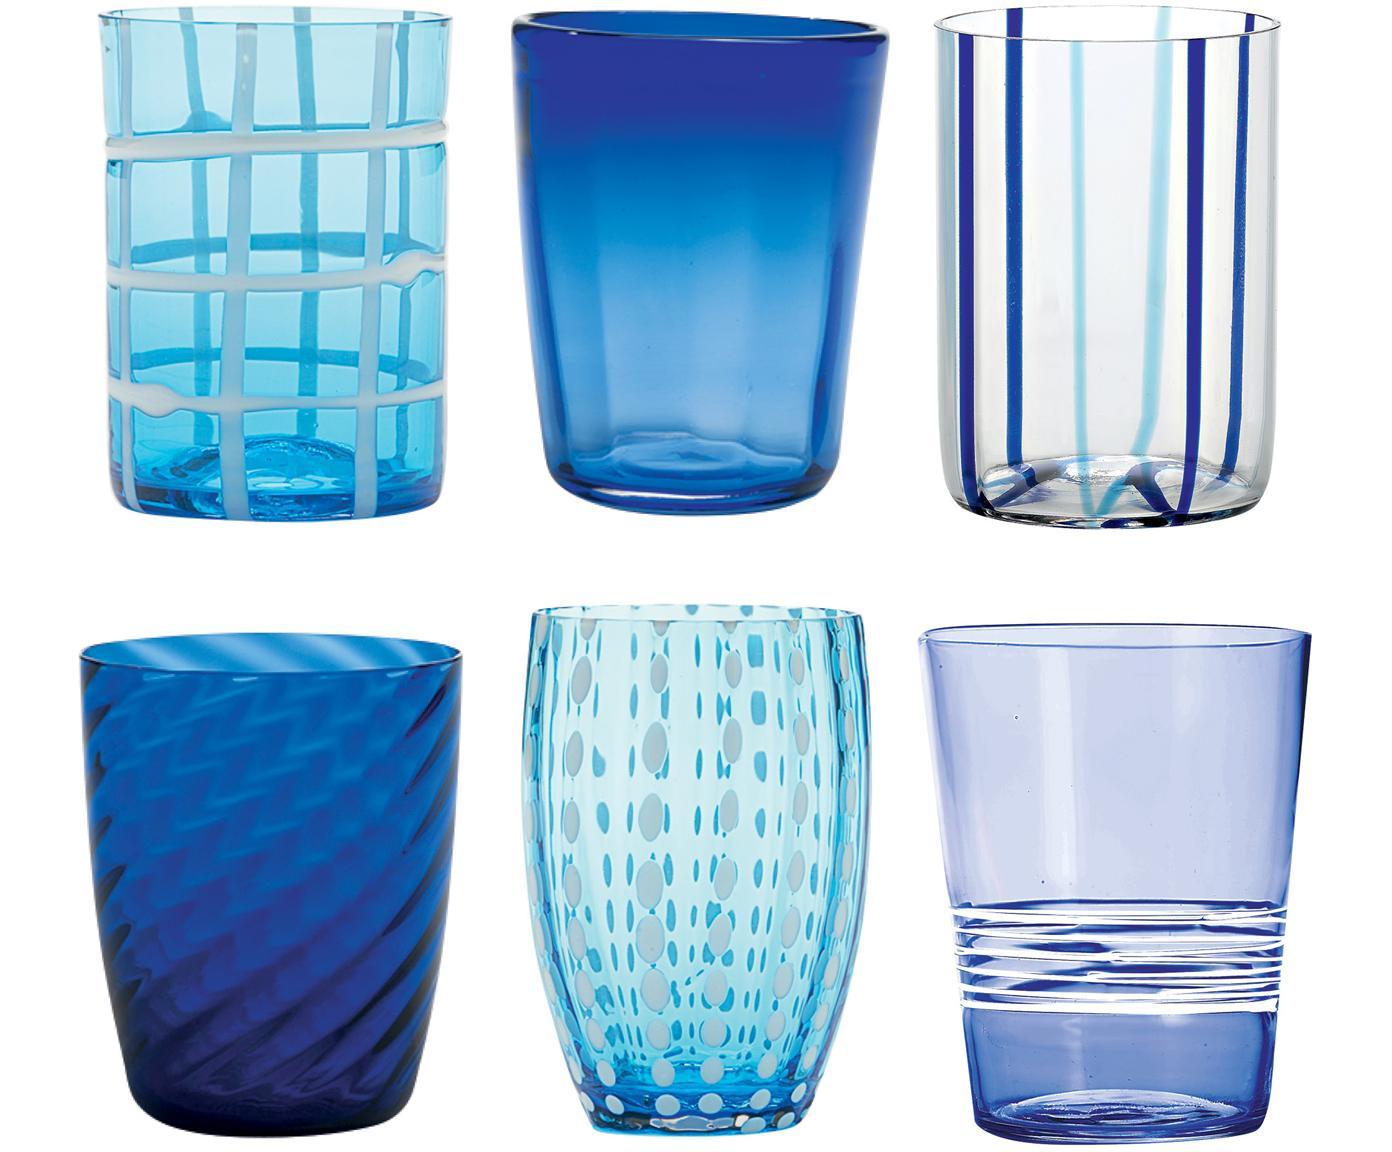 Mundgeblasene Wassergläser Melting Pot Sea in Blautönen, 6er-Set, Glas, Blautöne, Transparent, Sondergrößen